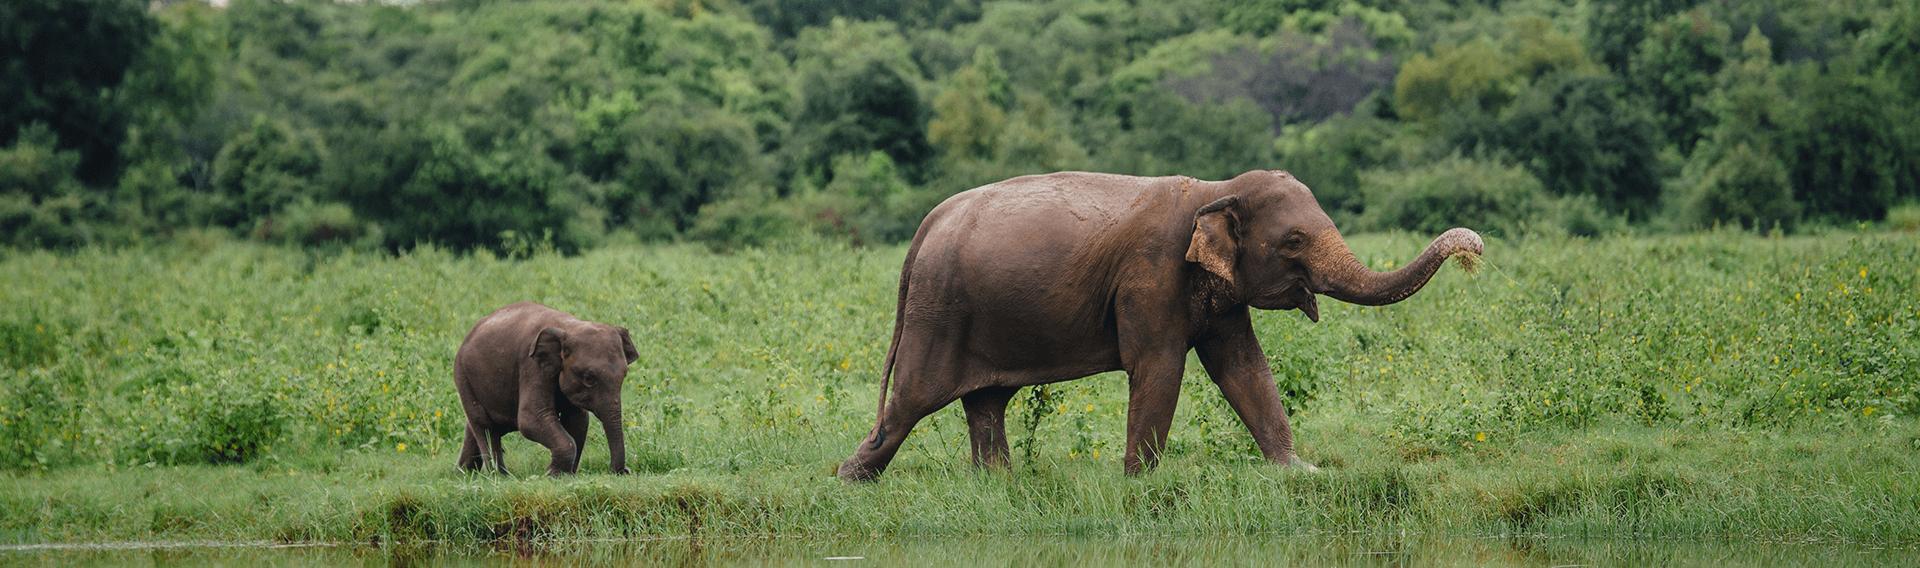 Circuits nature et vie sauvage en Asie